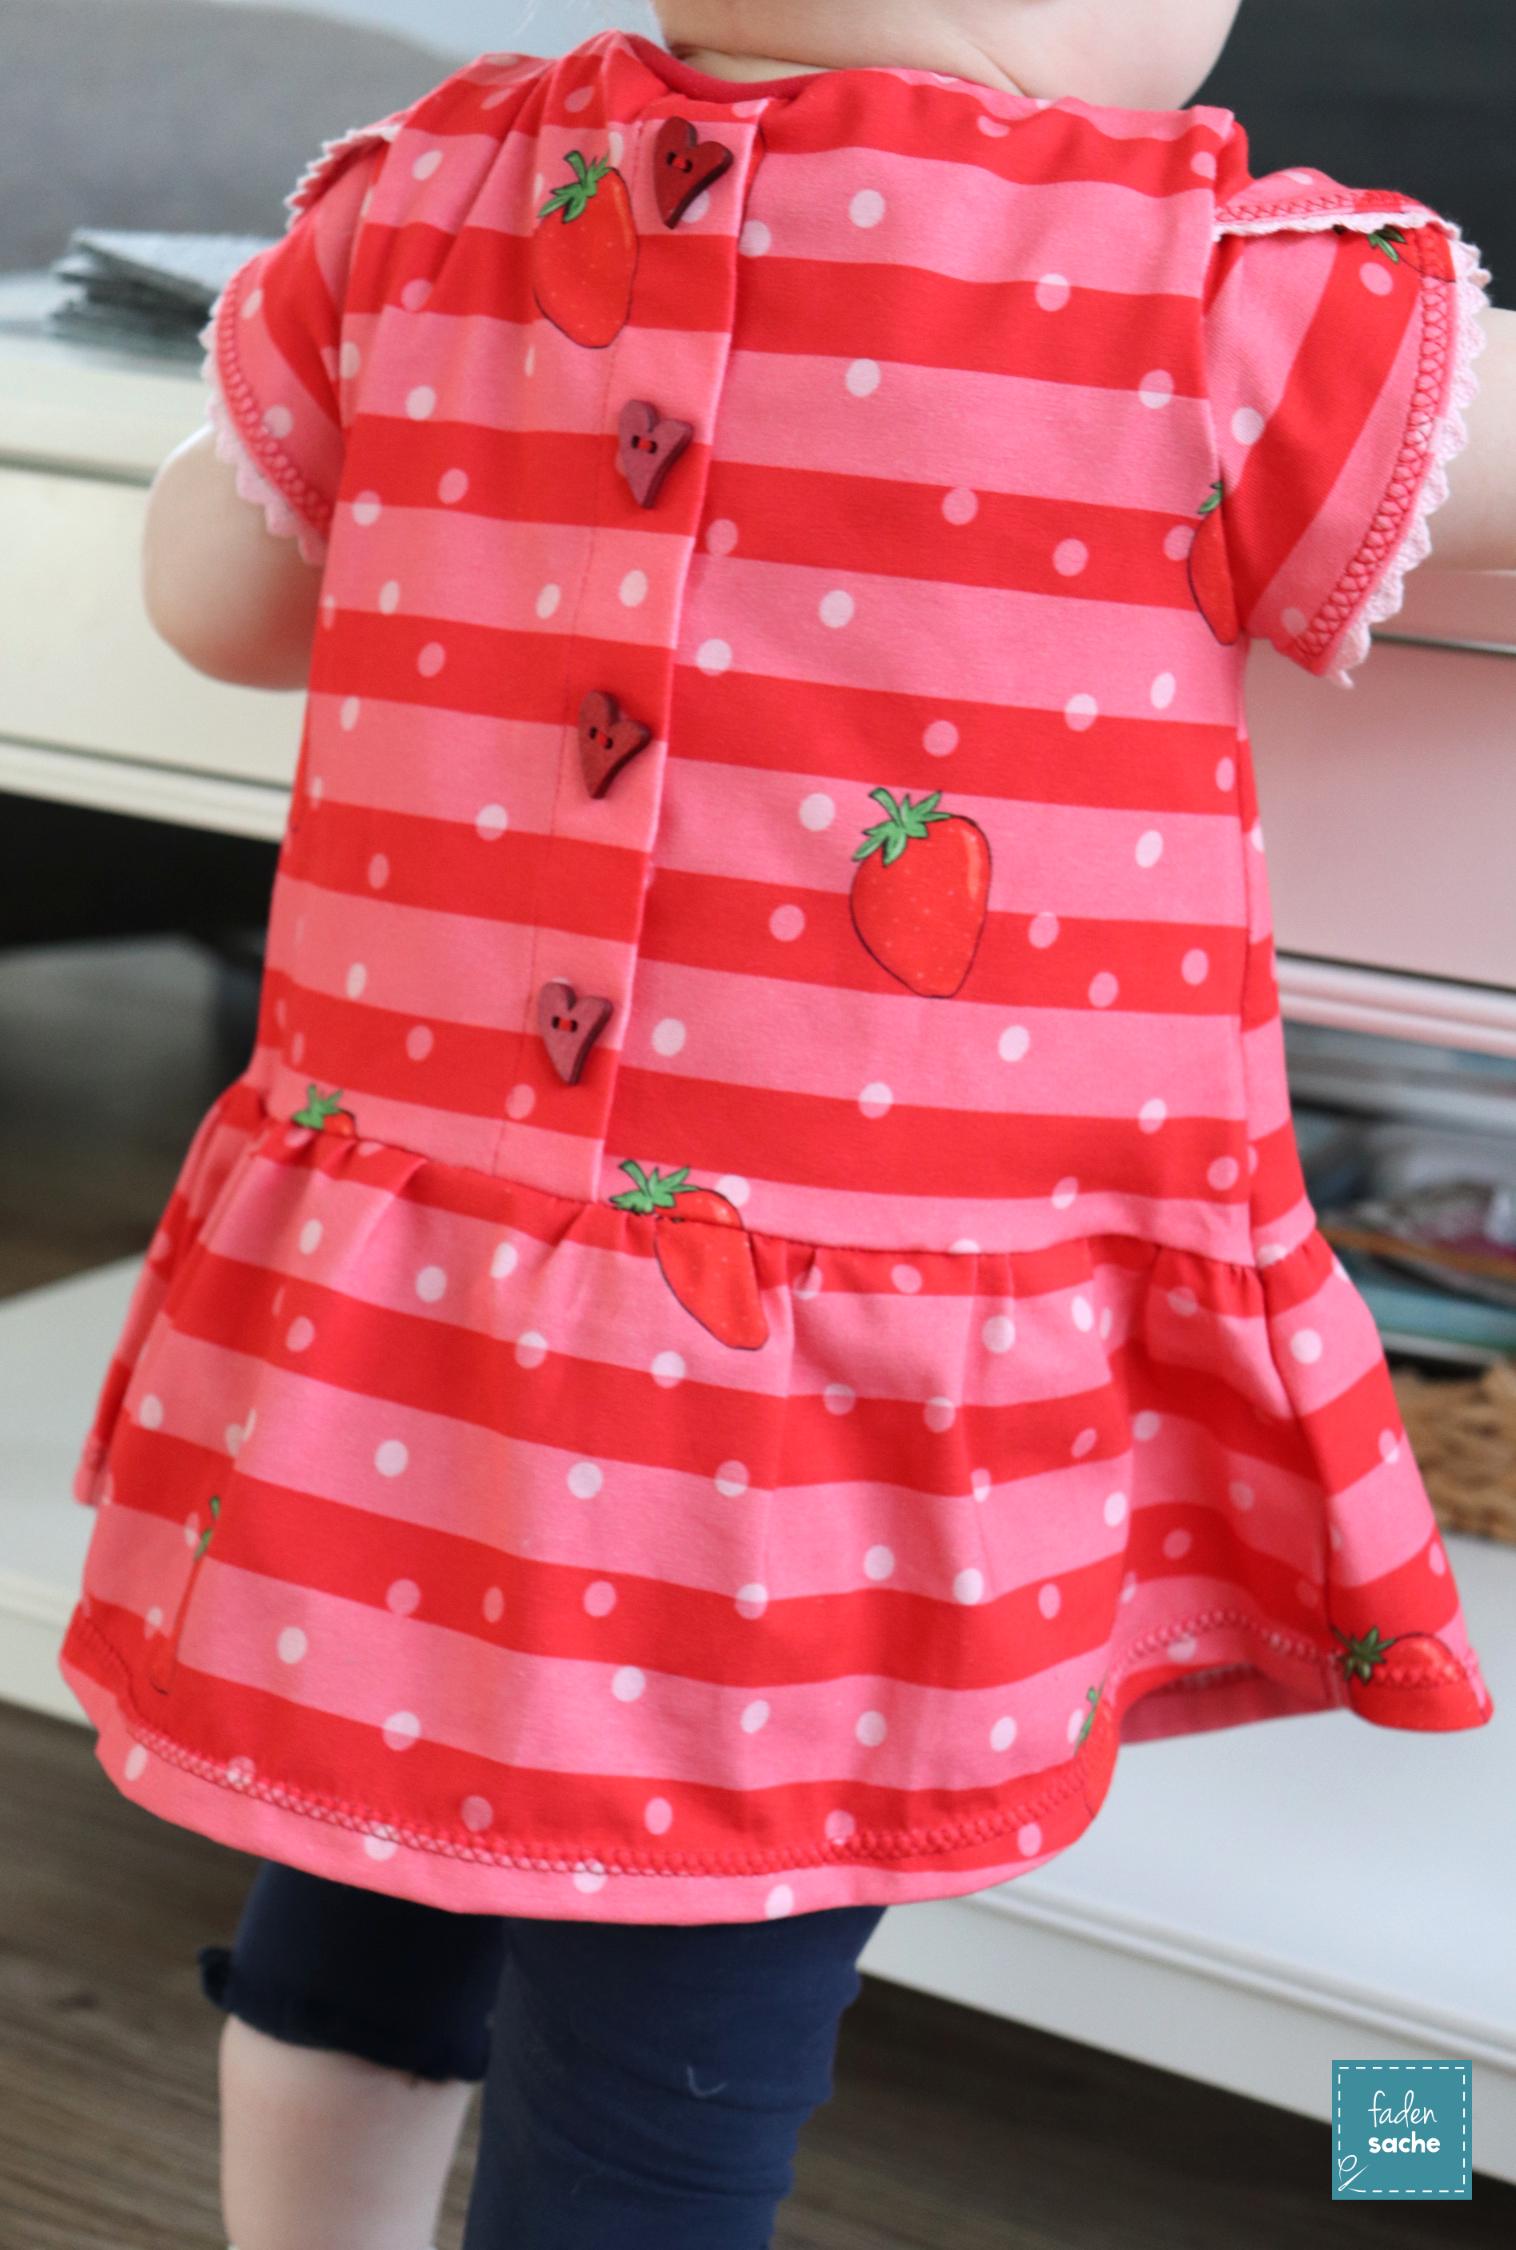 Ein süßes Erdbeeroutfit…